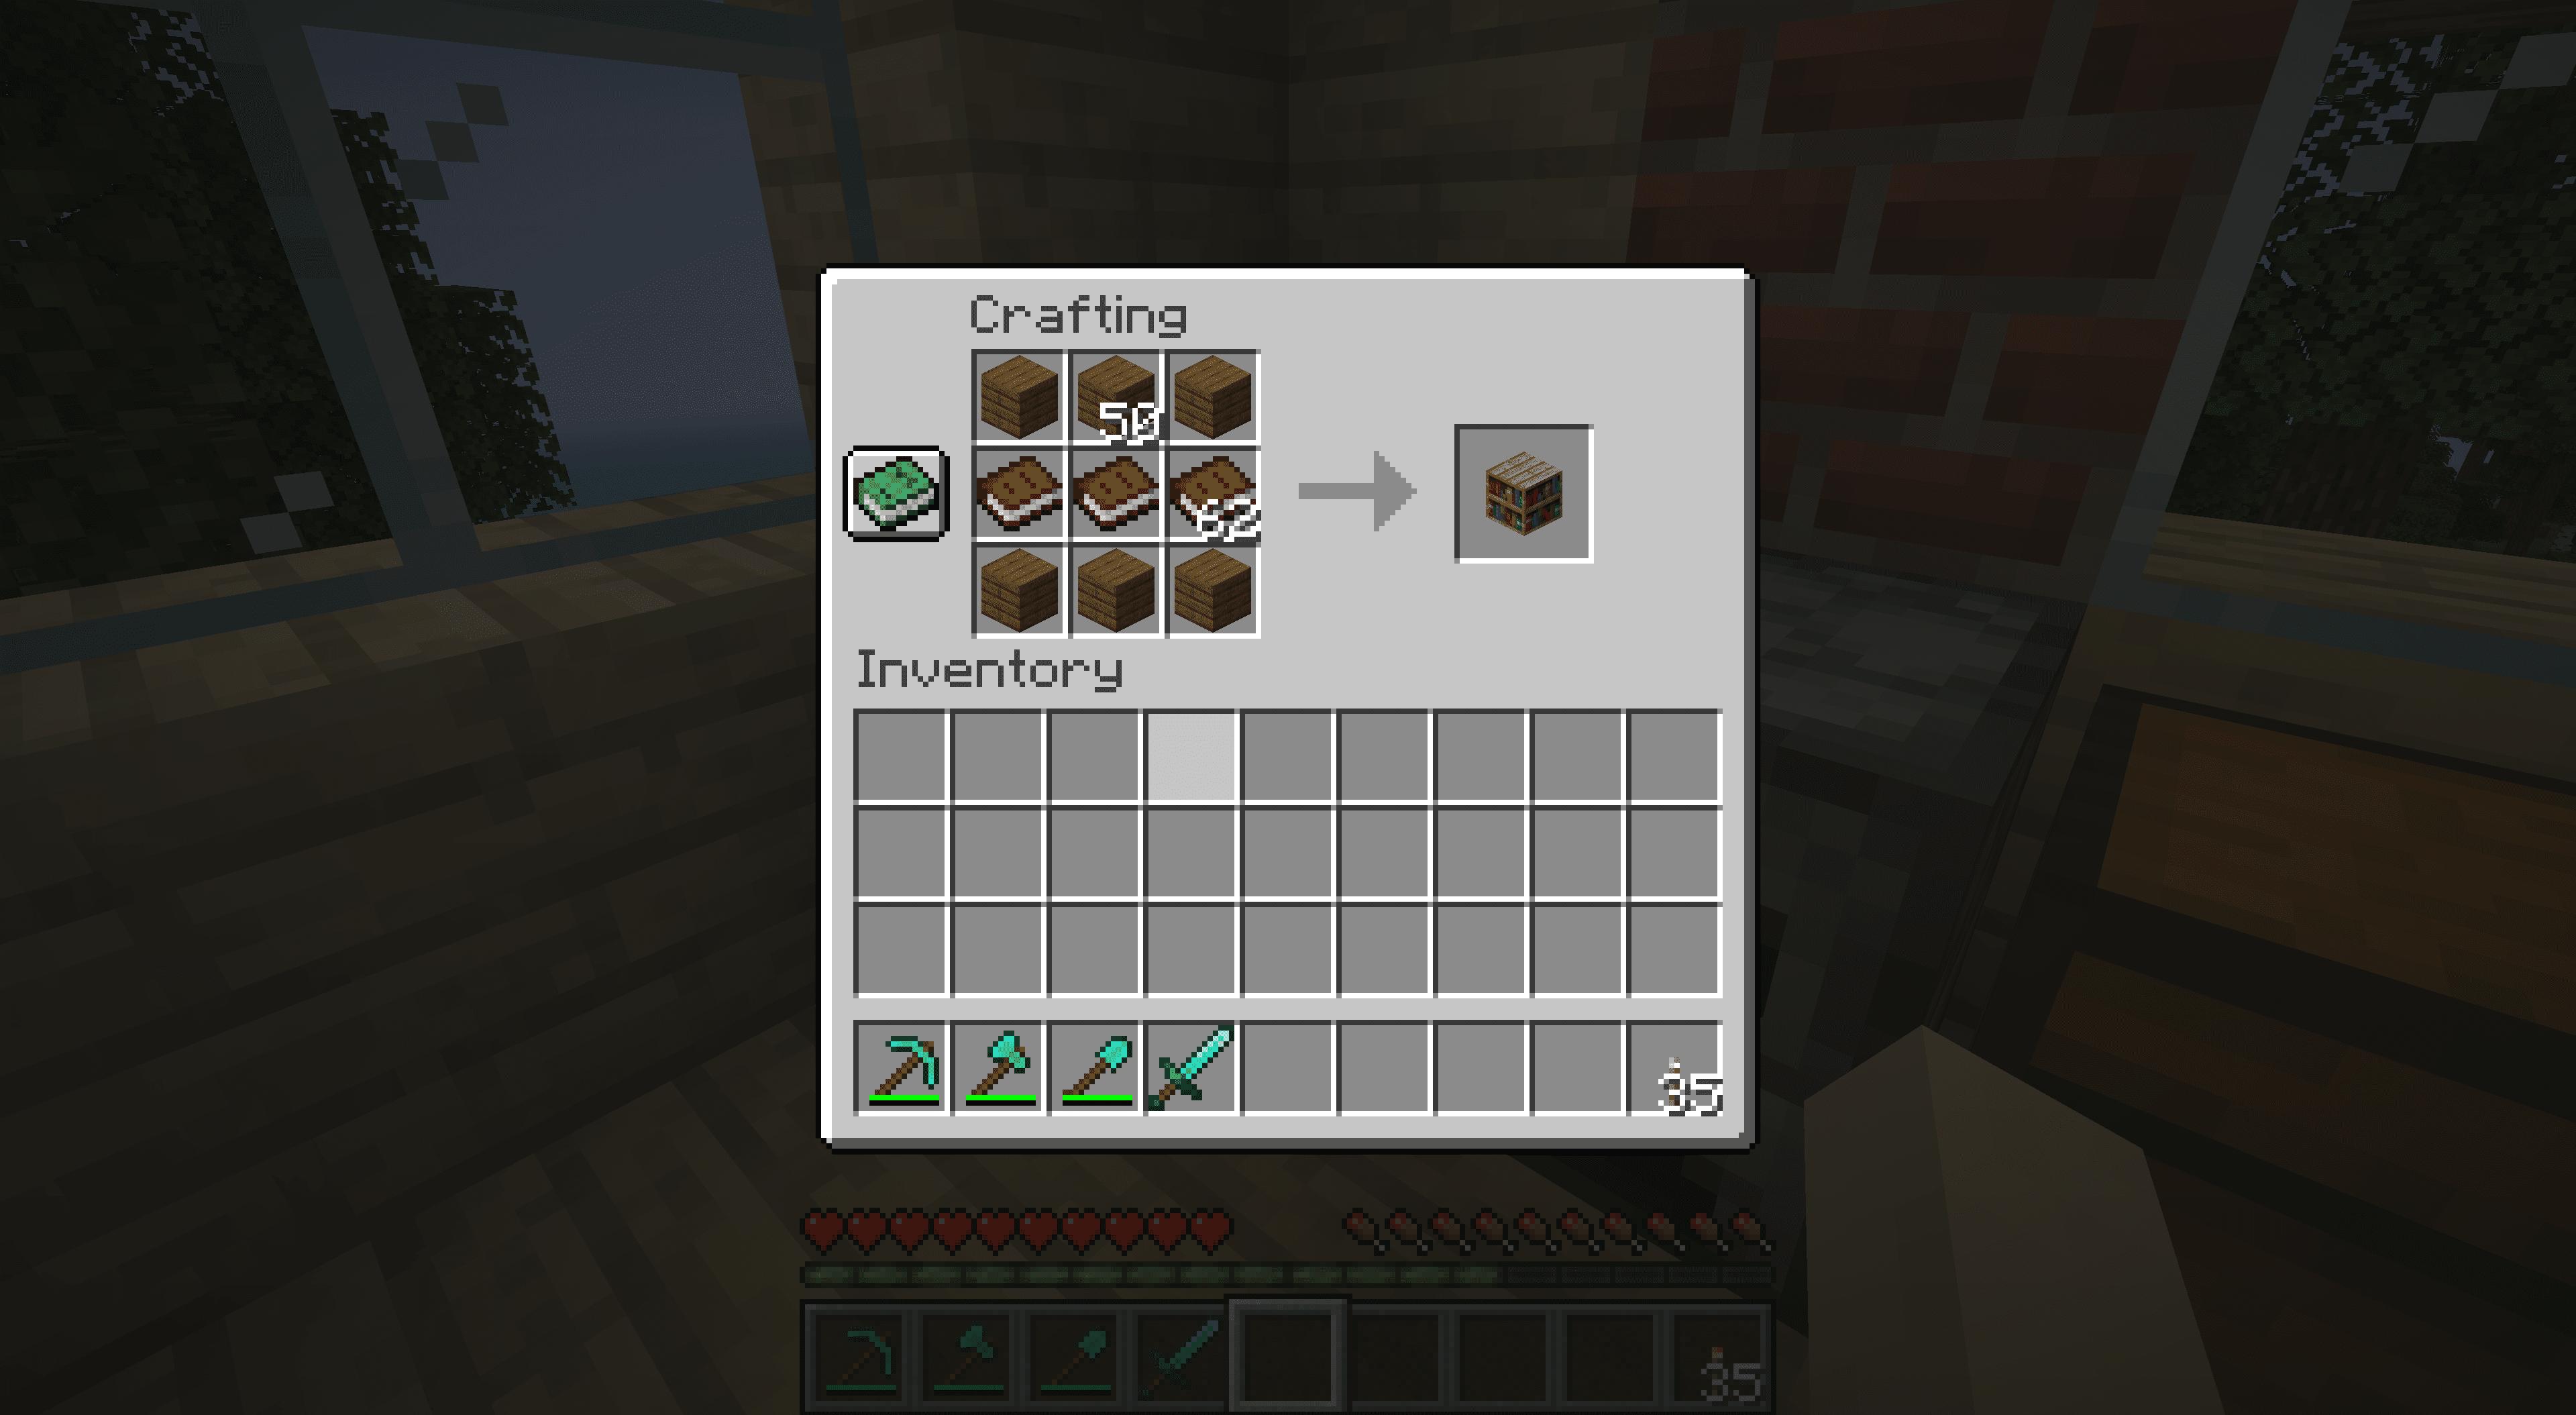 Crafting bookshelves in Minecraft.